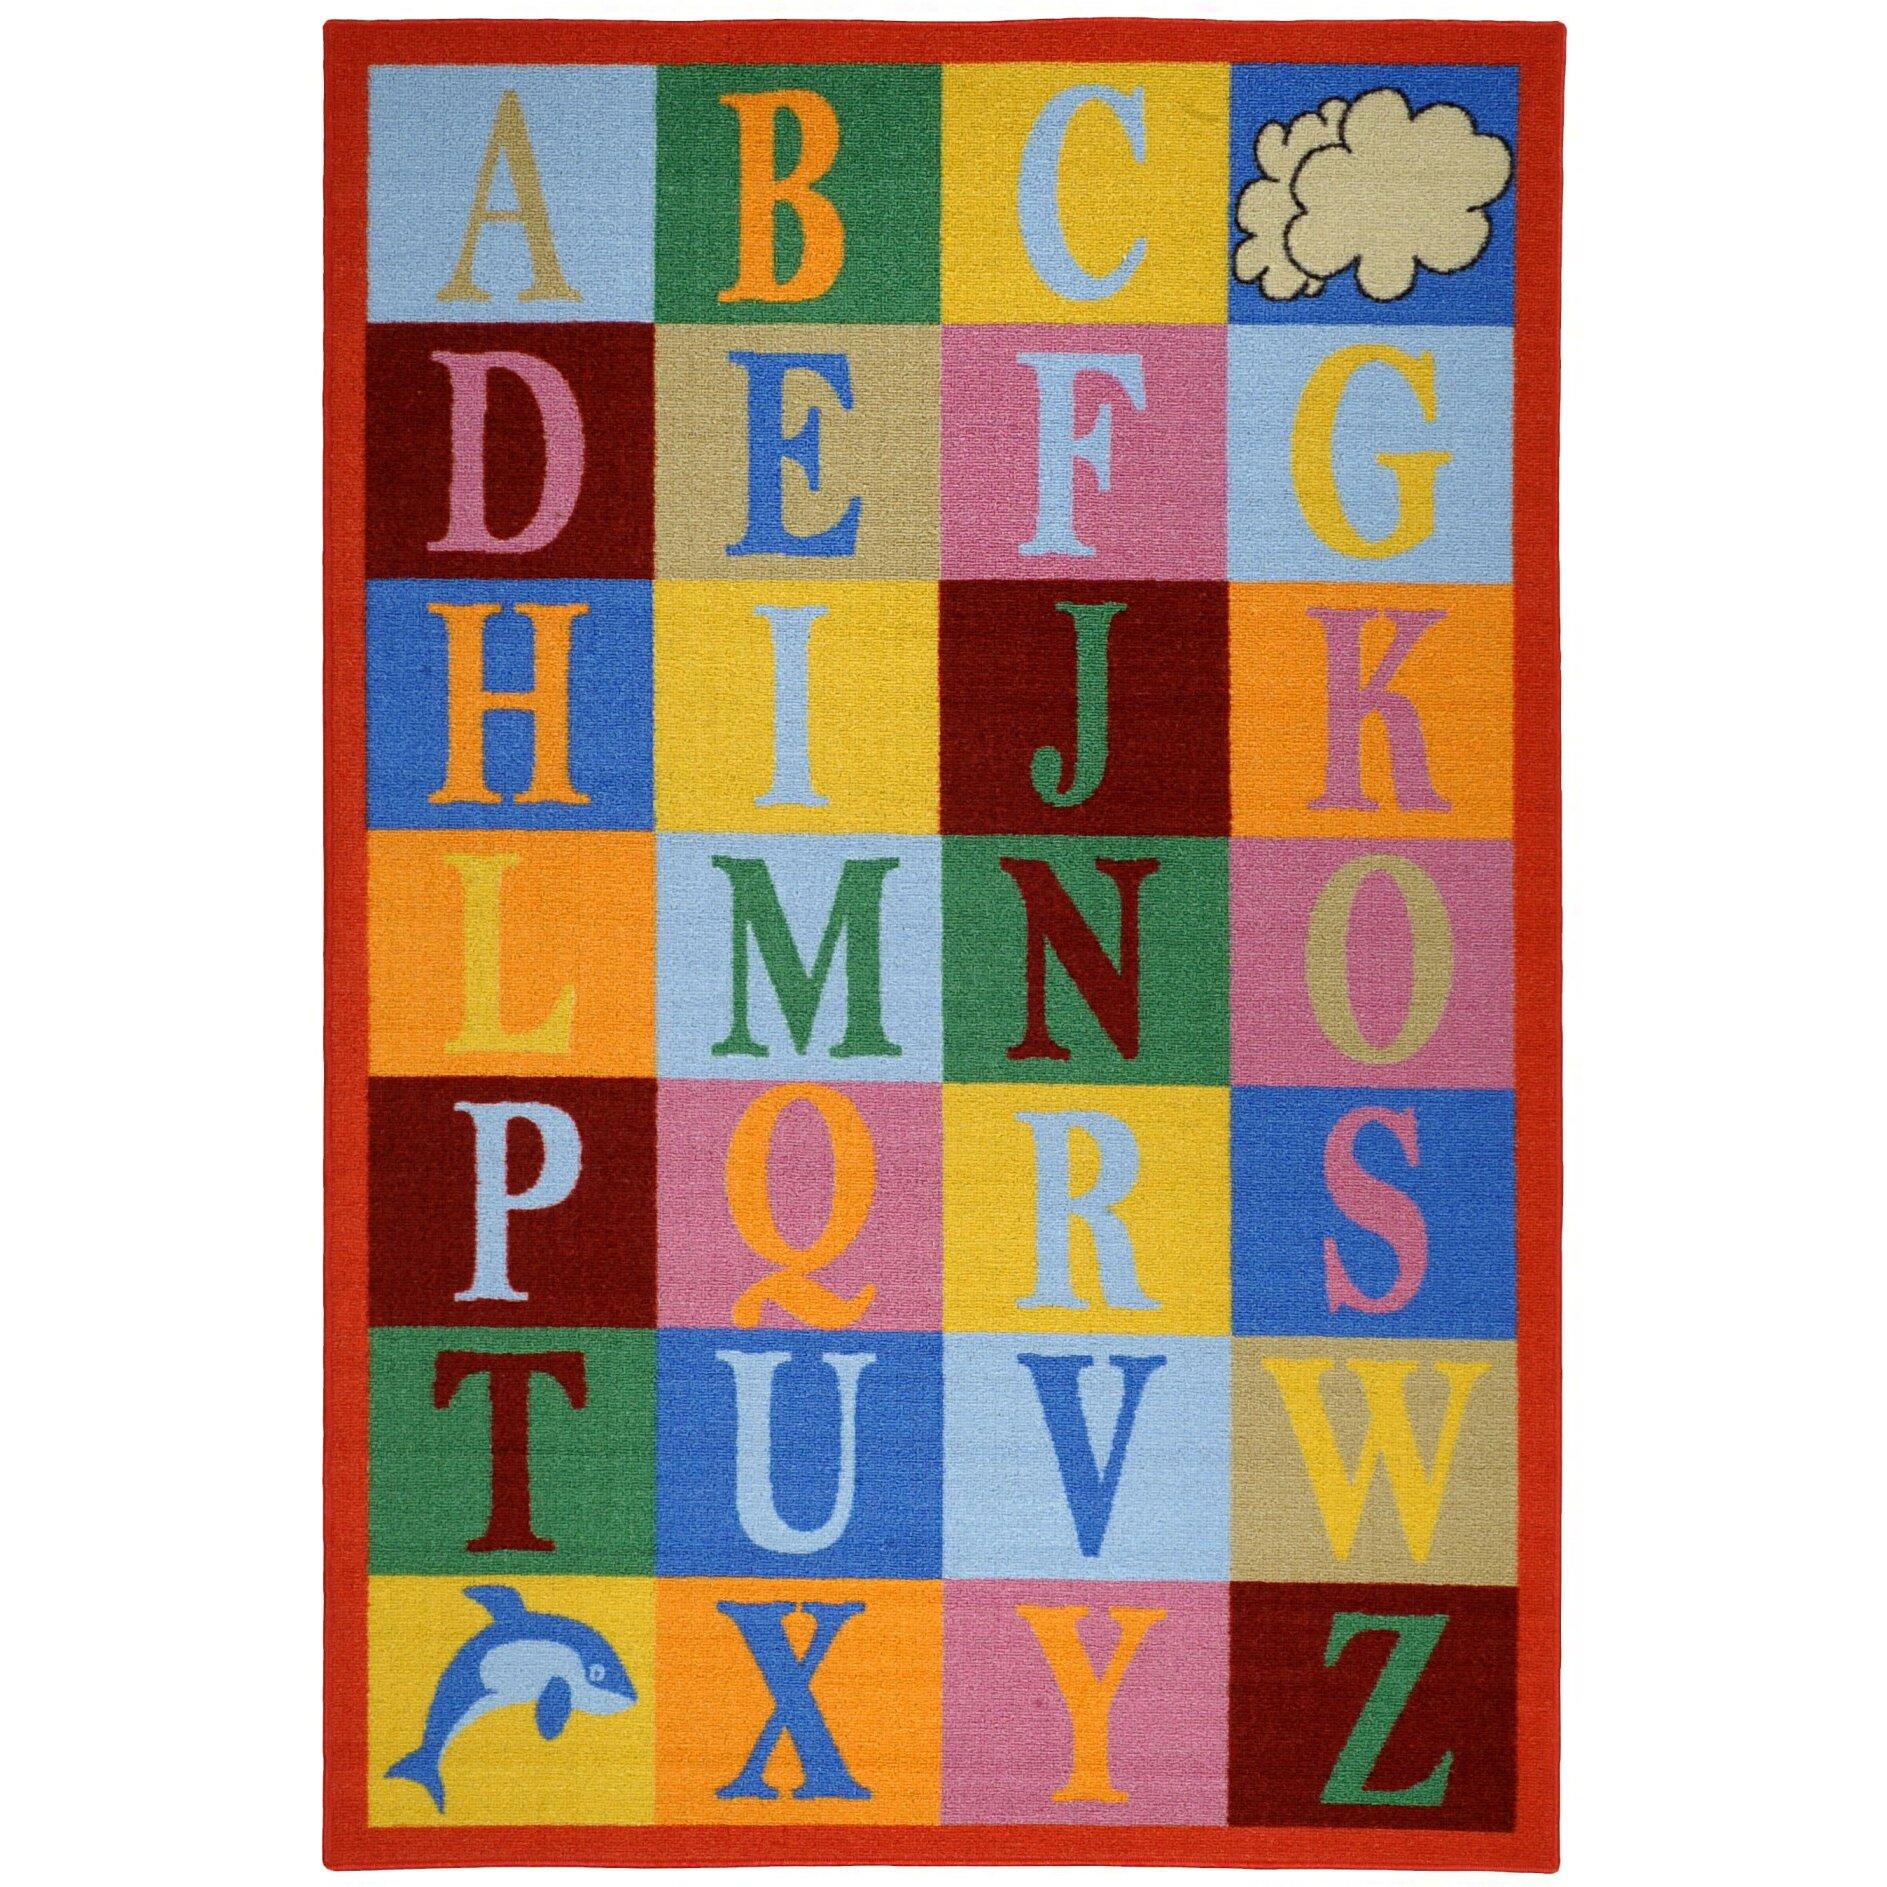 Bambino Kids Fun Time Educational Alphabet Boxes Area Rug